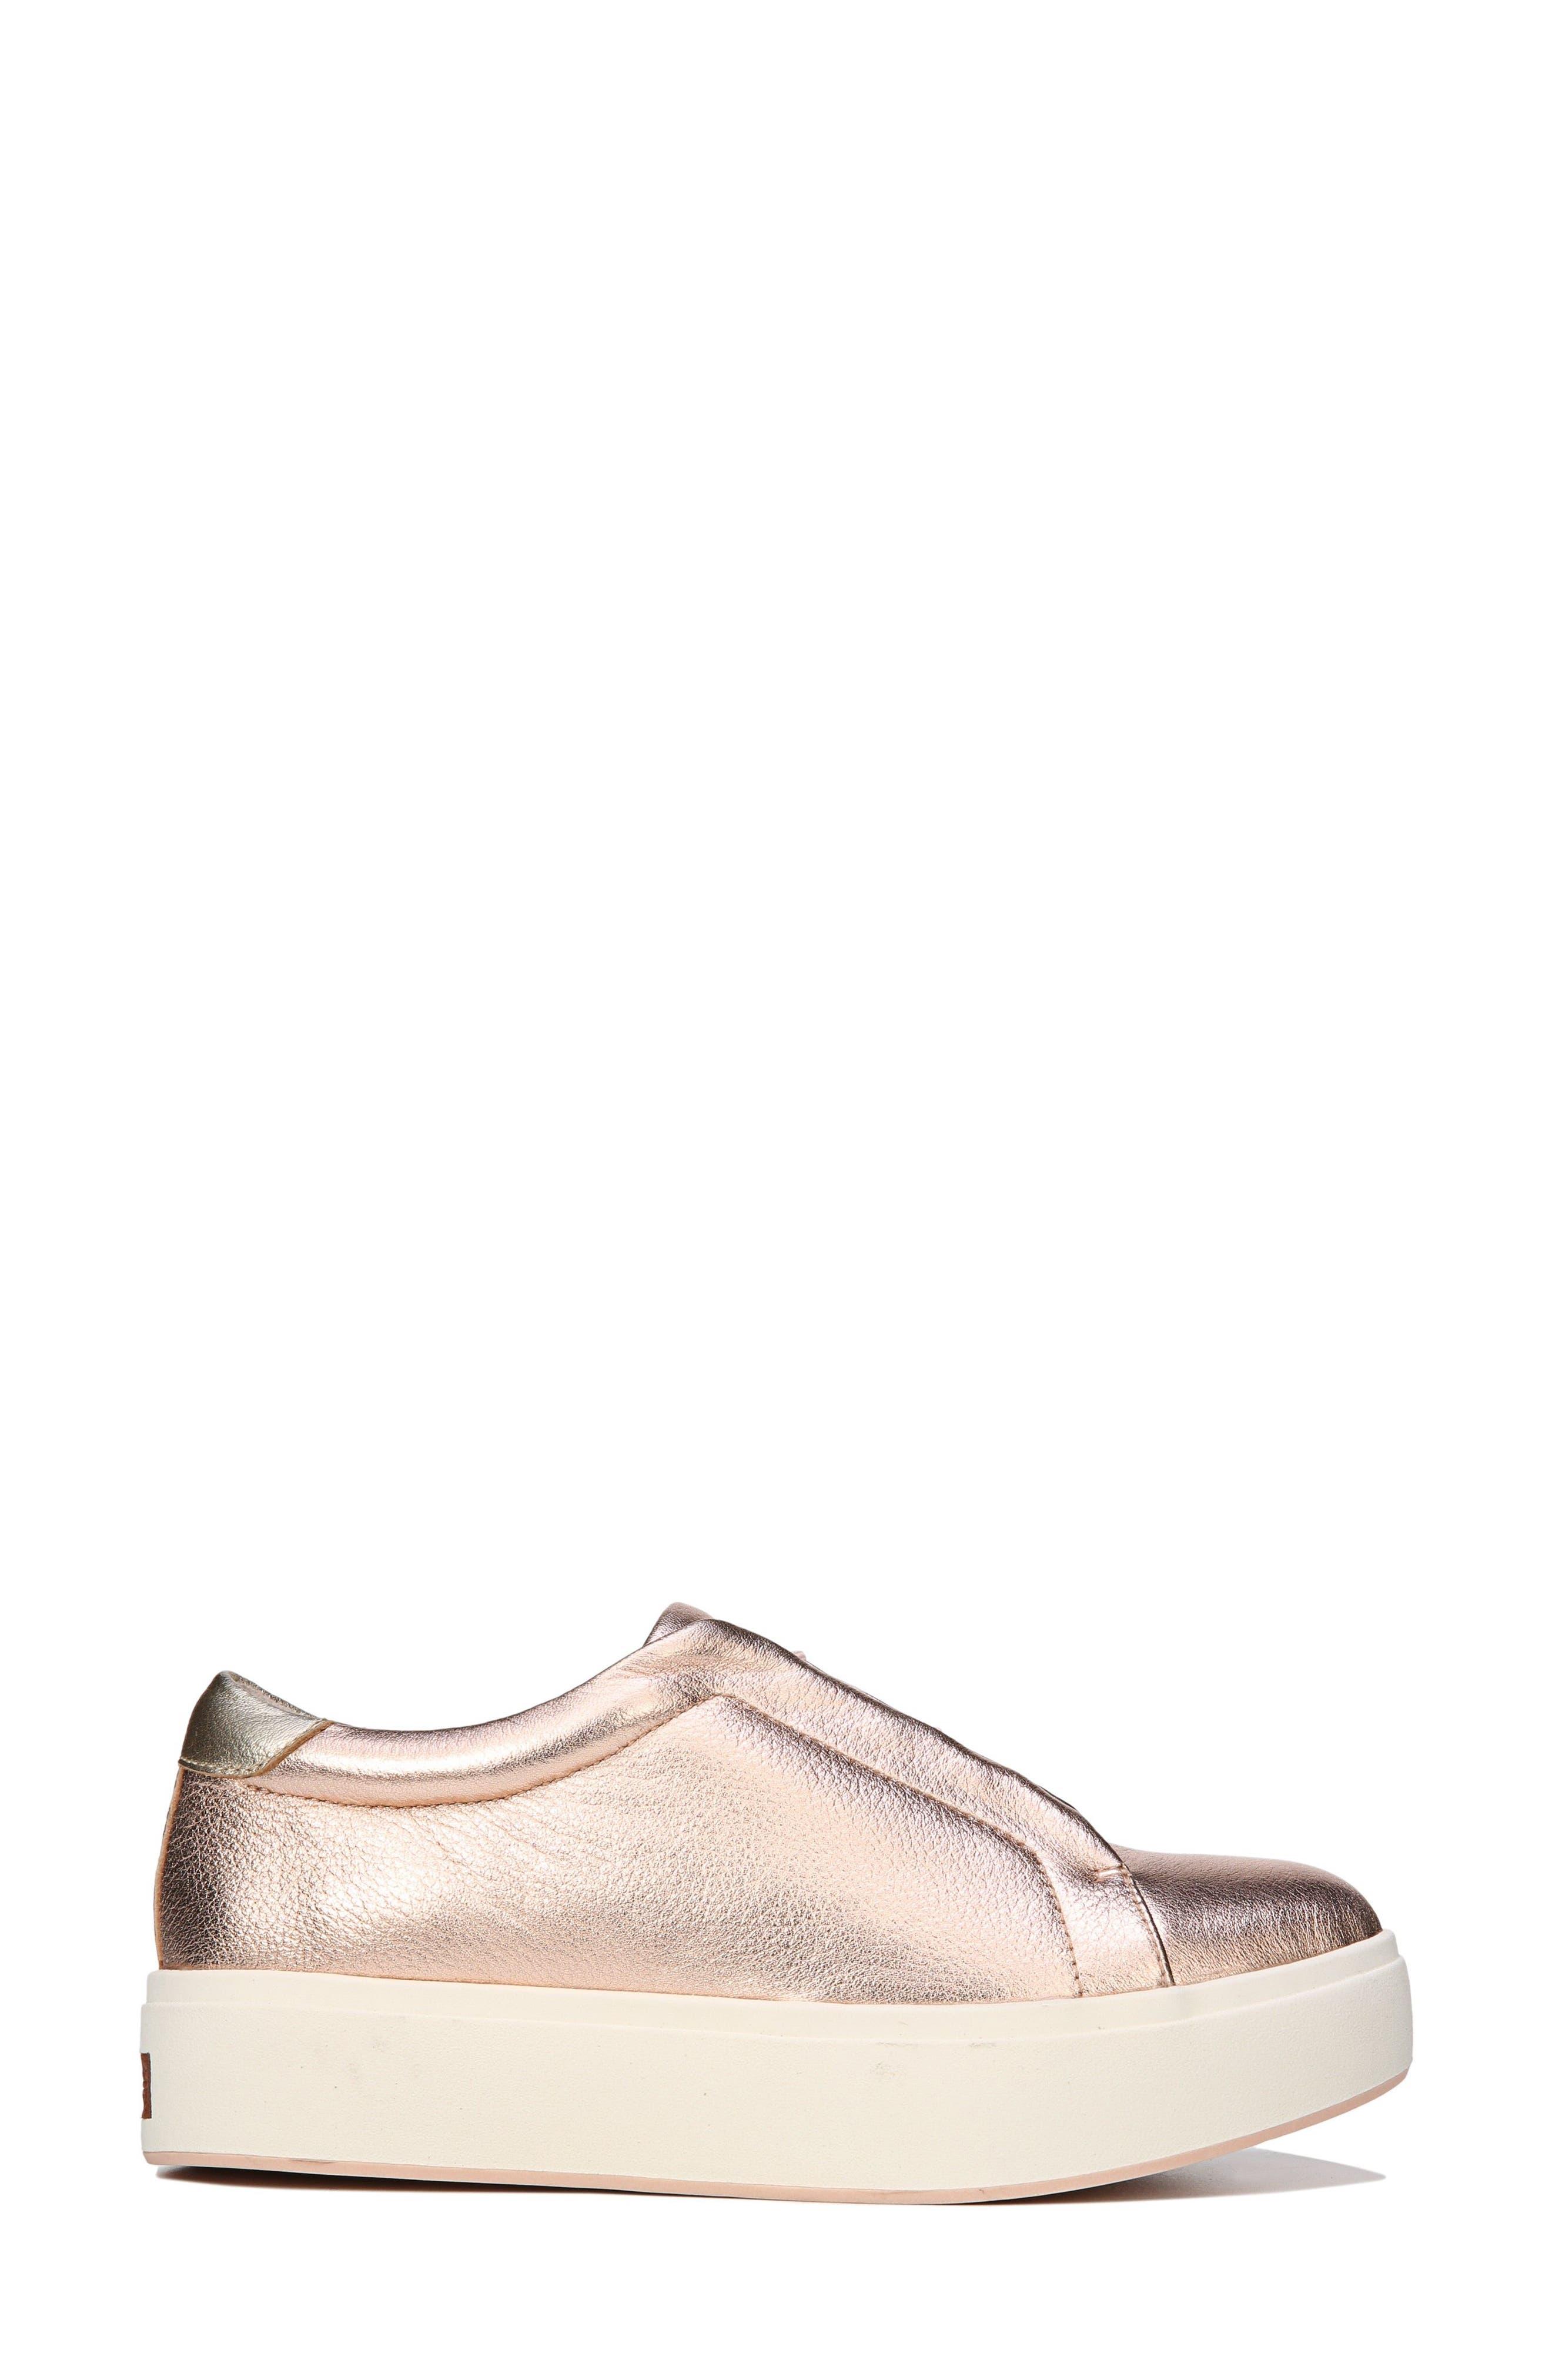 Alternate Image 3  - Dr. Scholl's Abbot Sneaker (Women)